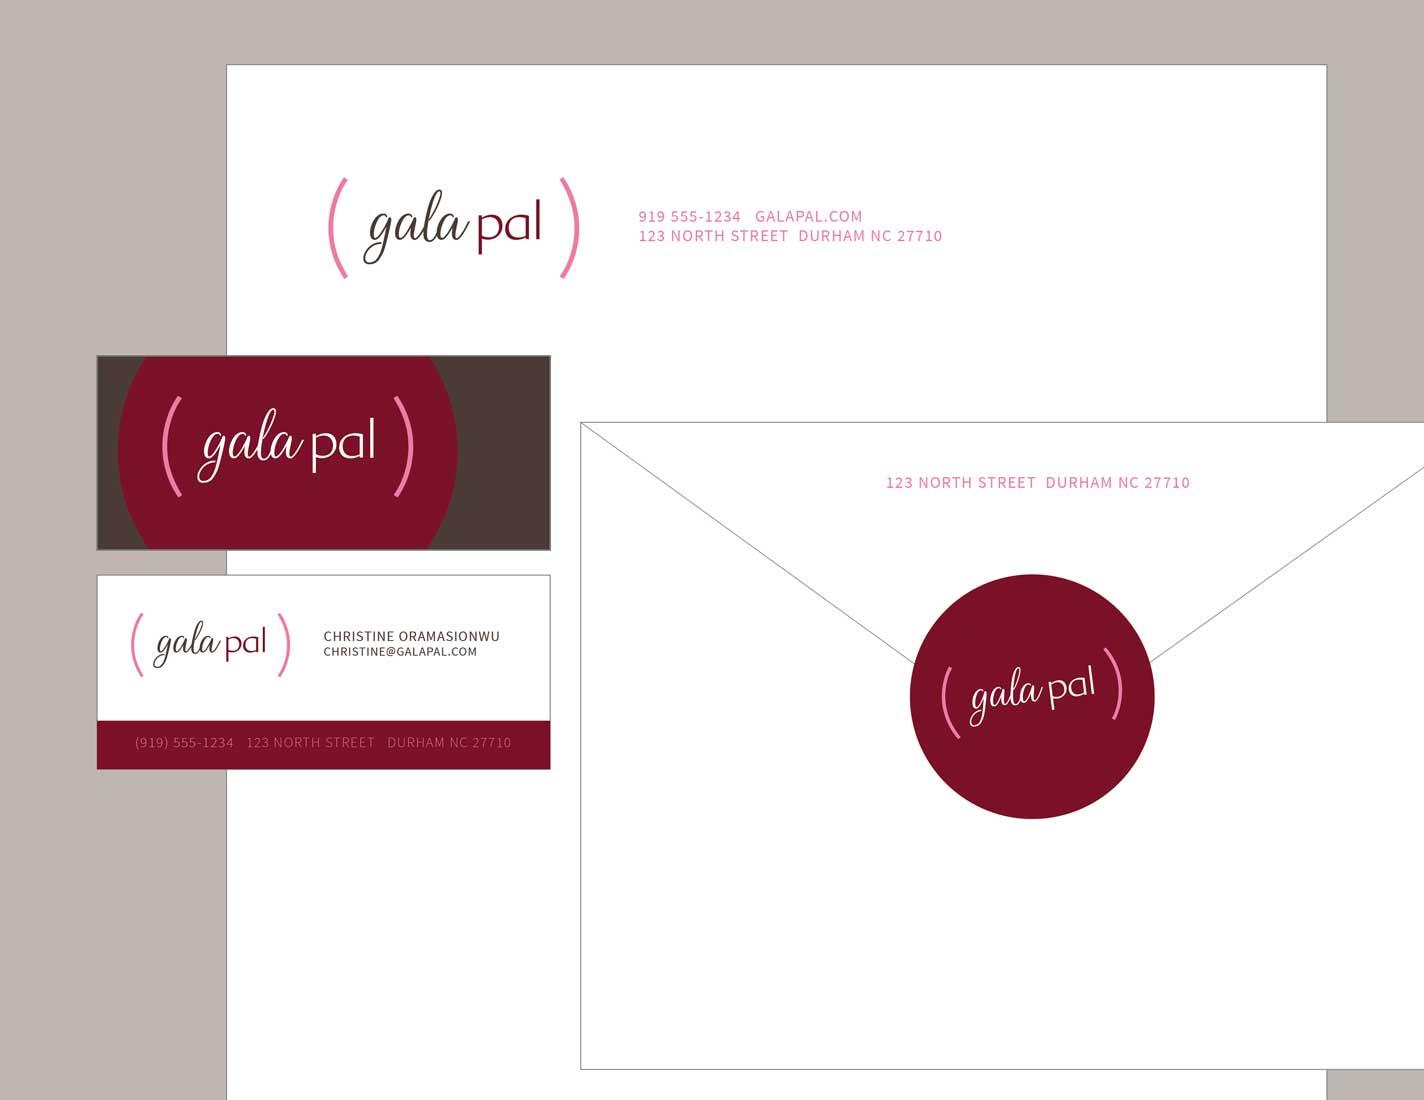 GalaPal-Letterhead.jpg